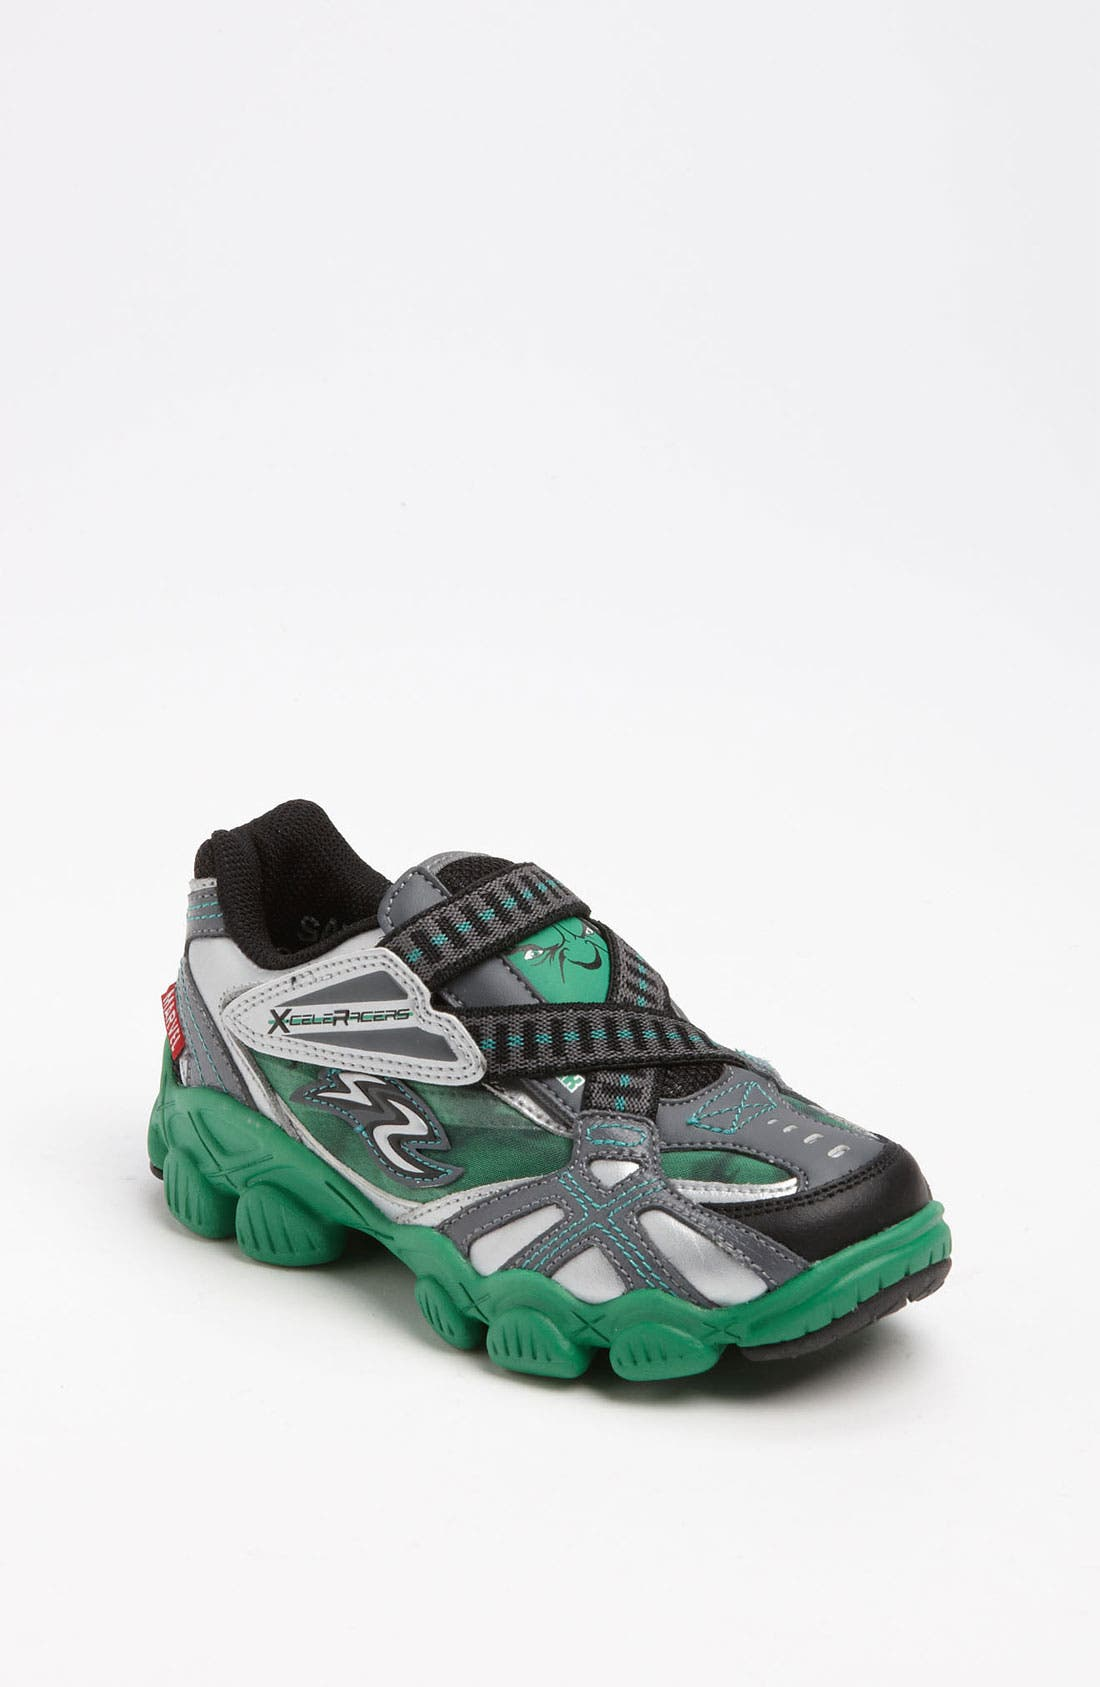 Alternate Image 1 Selected - Stride Ride 'X-Celeracers Hulk®' Sneaker (Toddler & Little Kid)